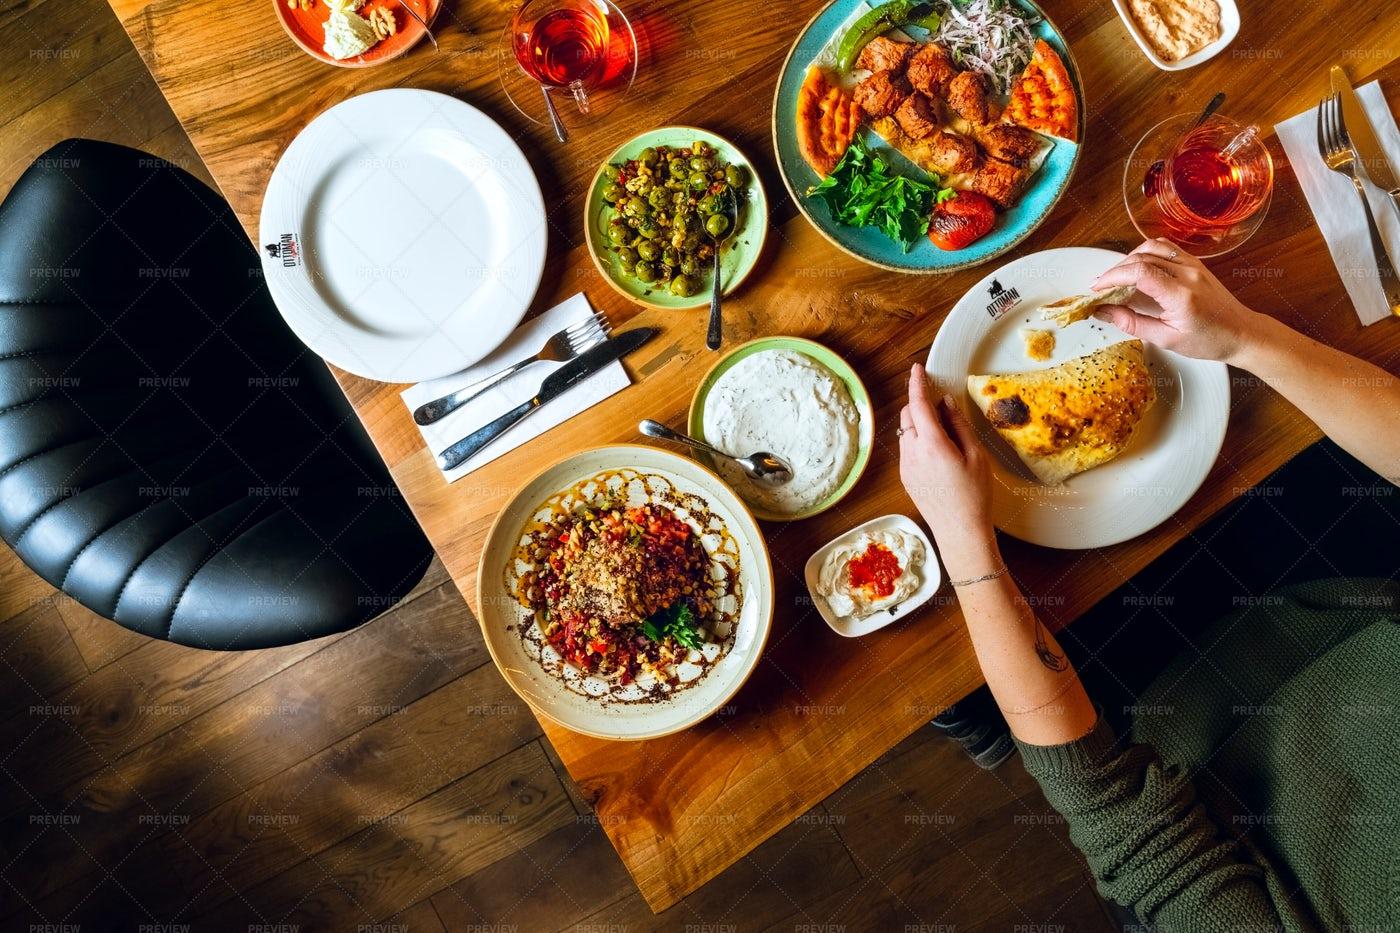 Enjoying Turkish Cuisine: Stock Photos